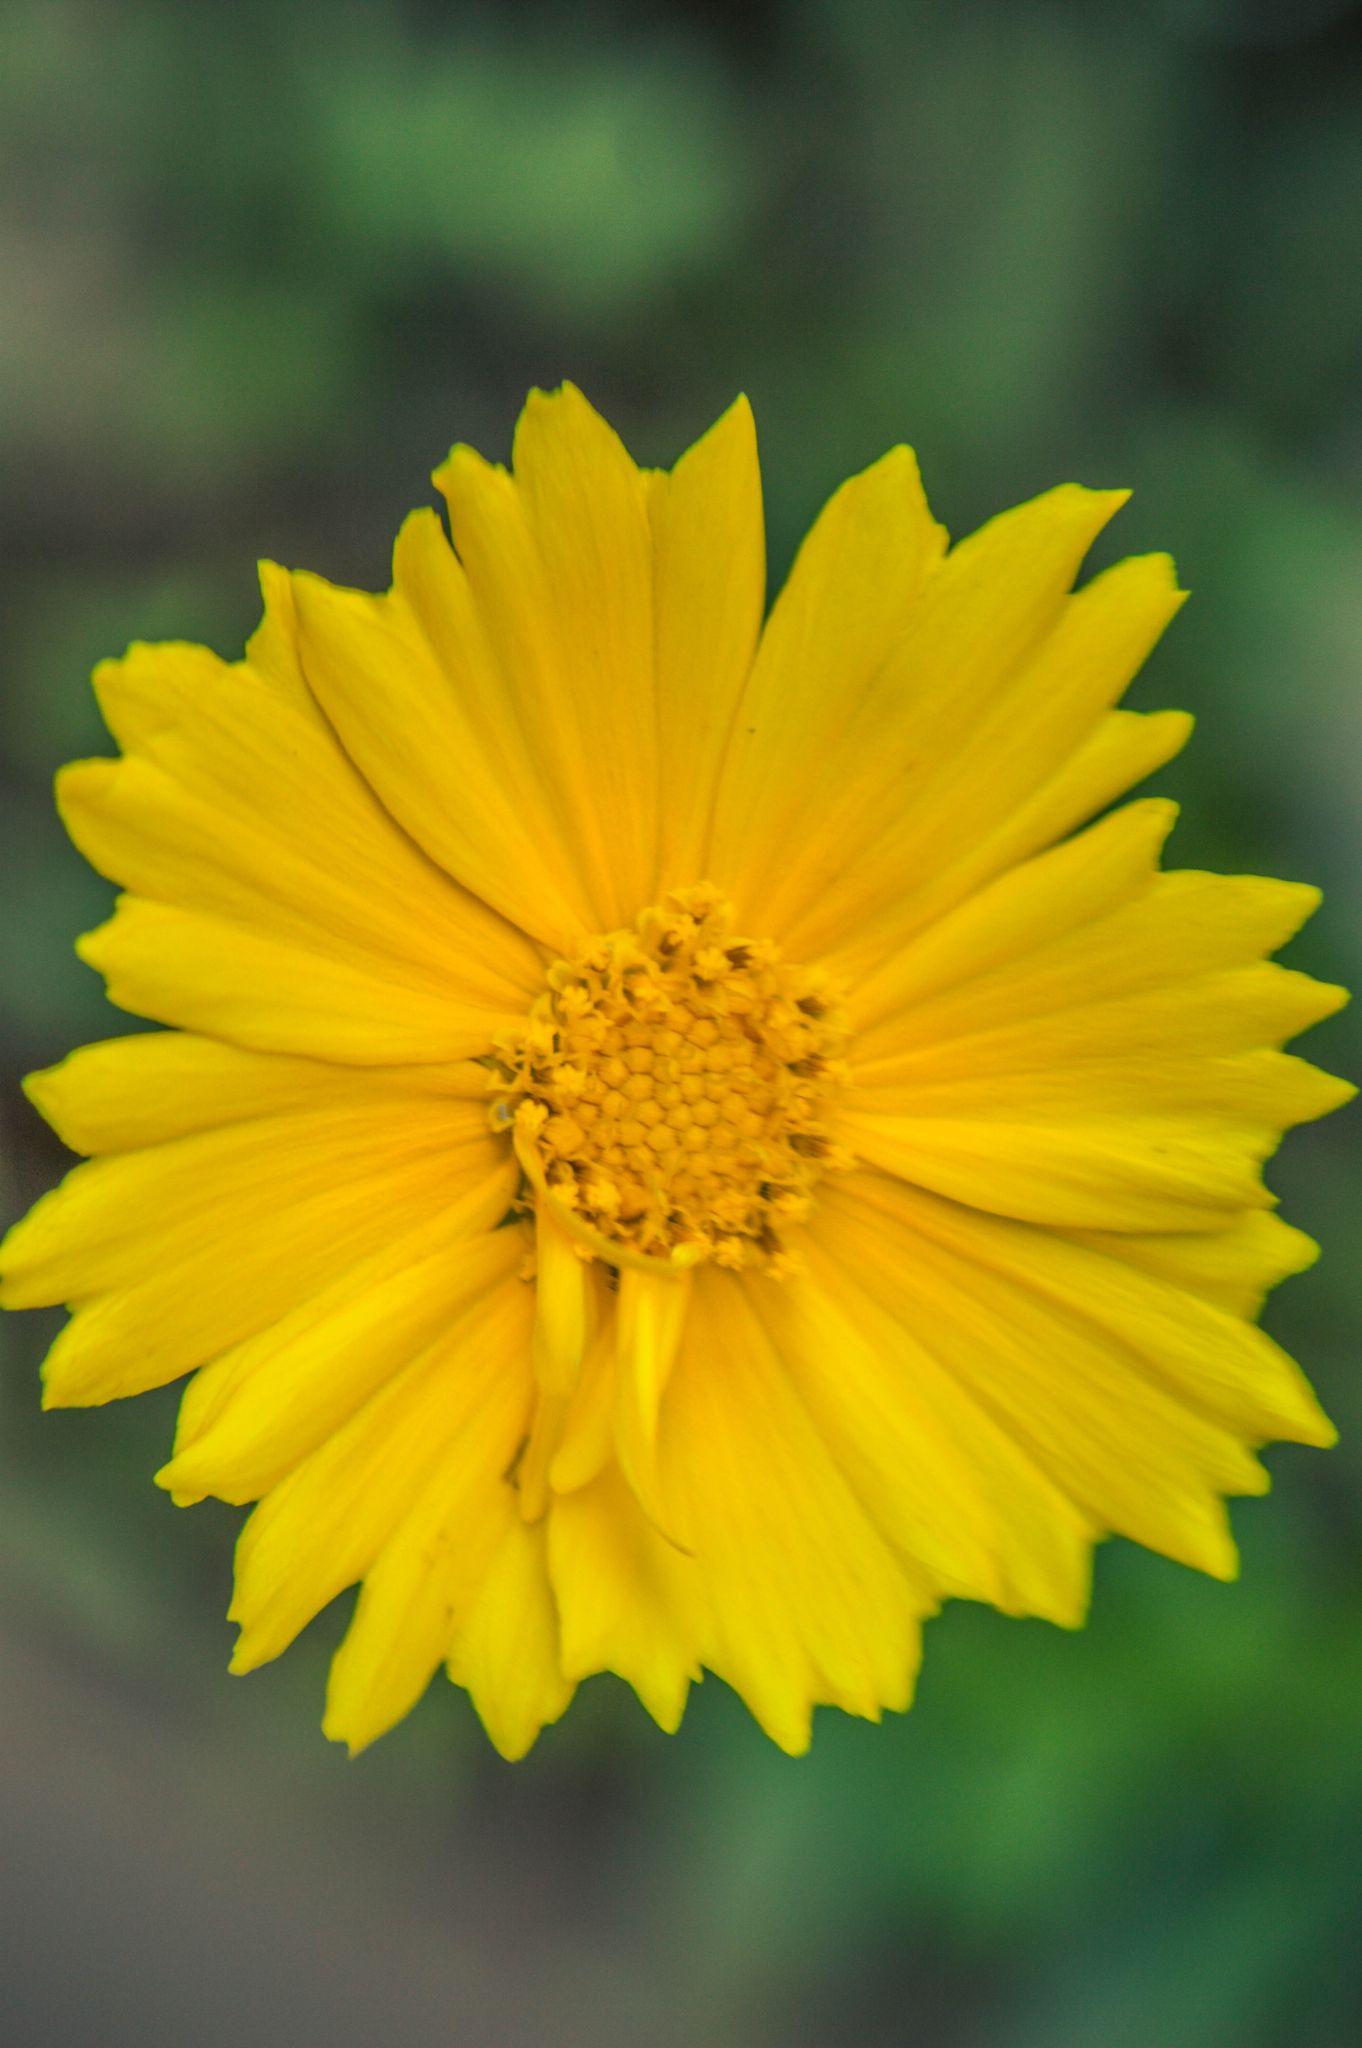 Cute Yellow Flower by HABEEB RAHMAN